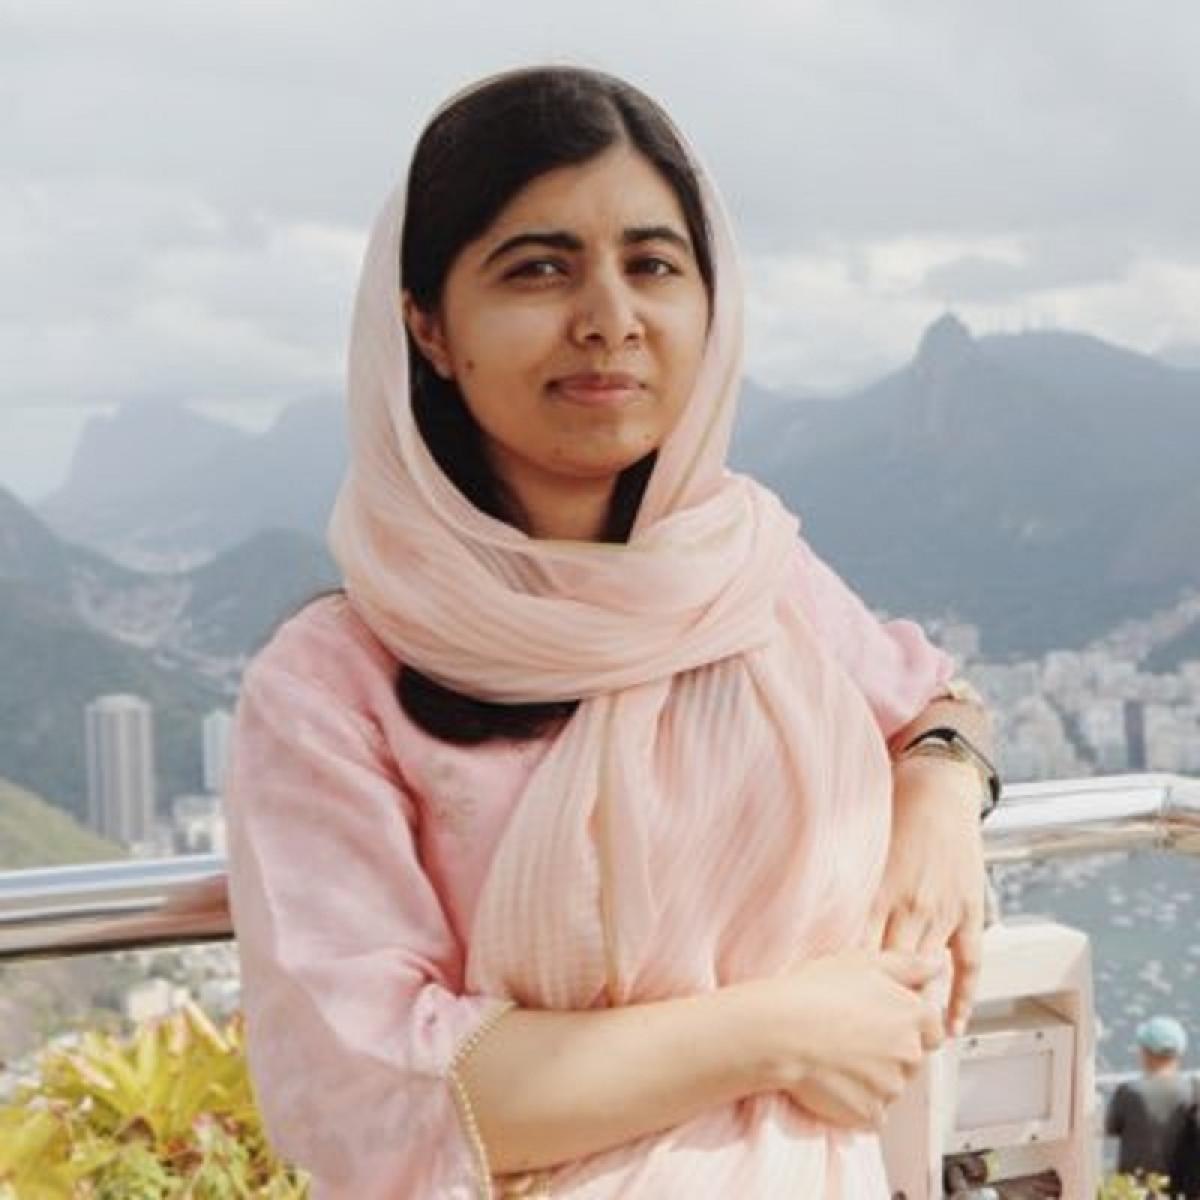 UN to organise 'Gul Makai' screening, director elated